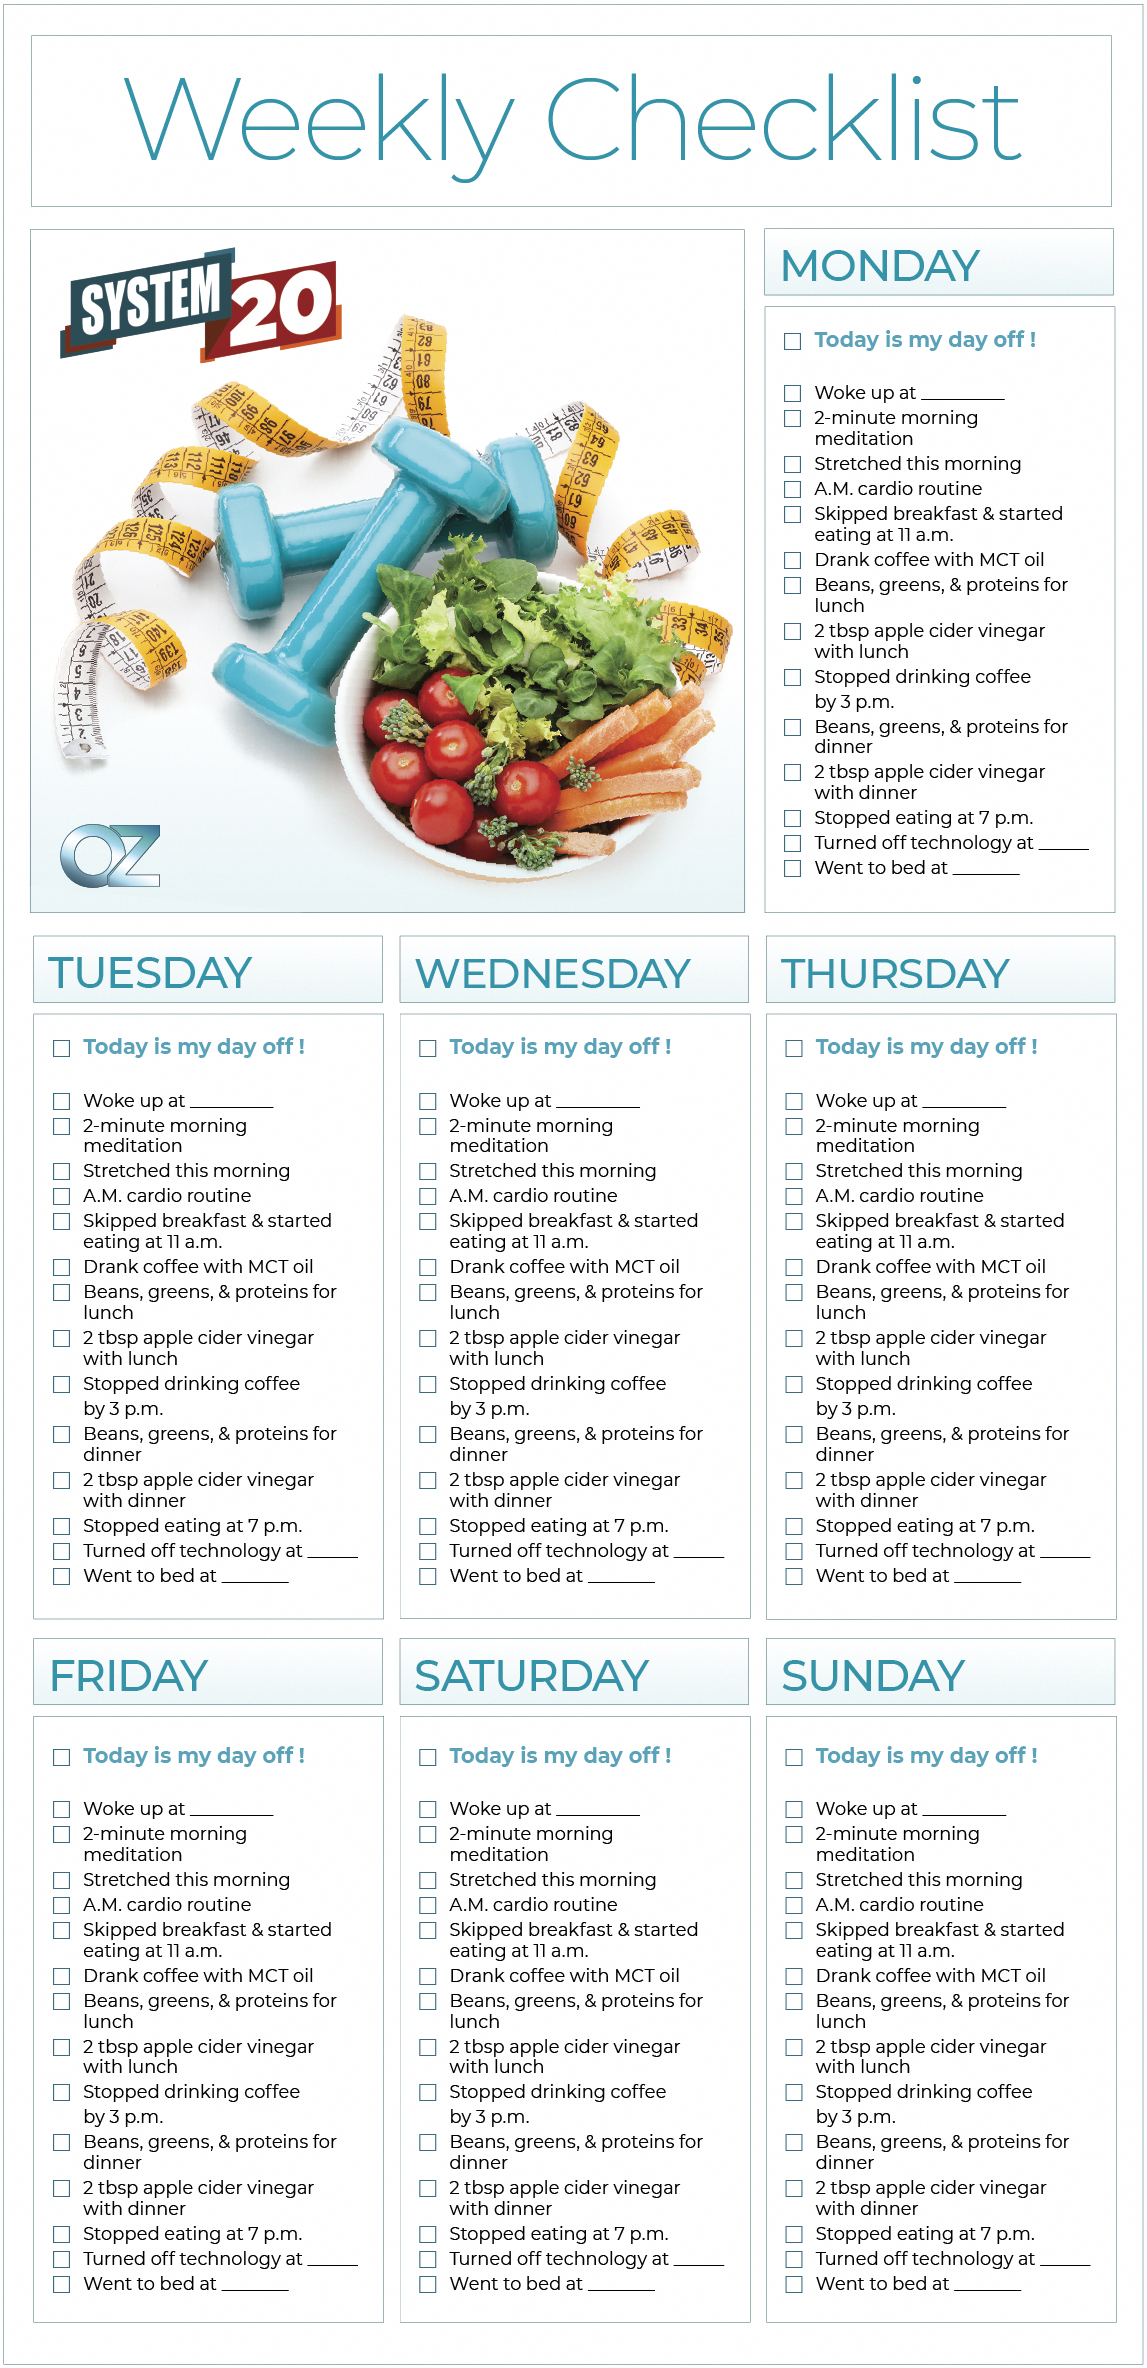 Lowcarbdietrecipes 7dayeggandgrapefruitdietmenu In 2020 Eating Schedule Diet And Nutrition Healthy Eating Plan